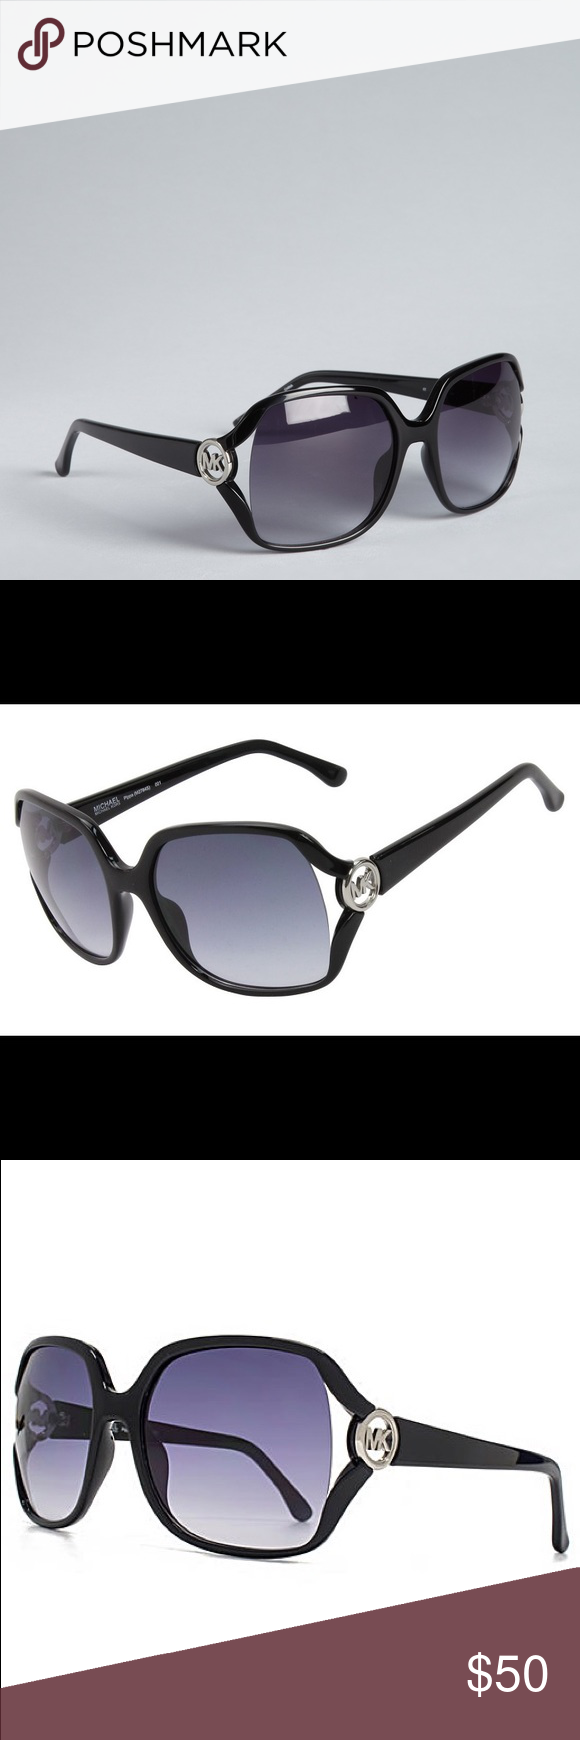 095c6f989661e Michael Kors Pippa Sunglasses Cute oversized square sunglasses by Michael  Kors in  Pippa  style